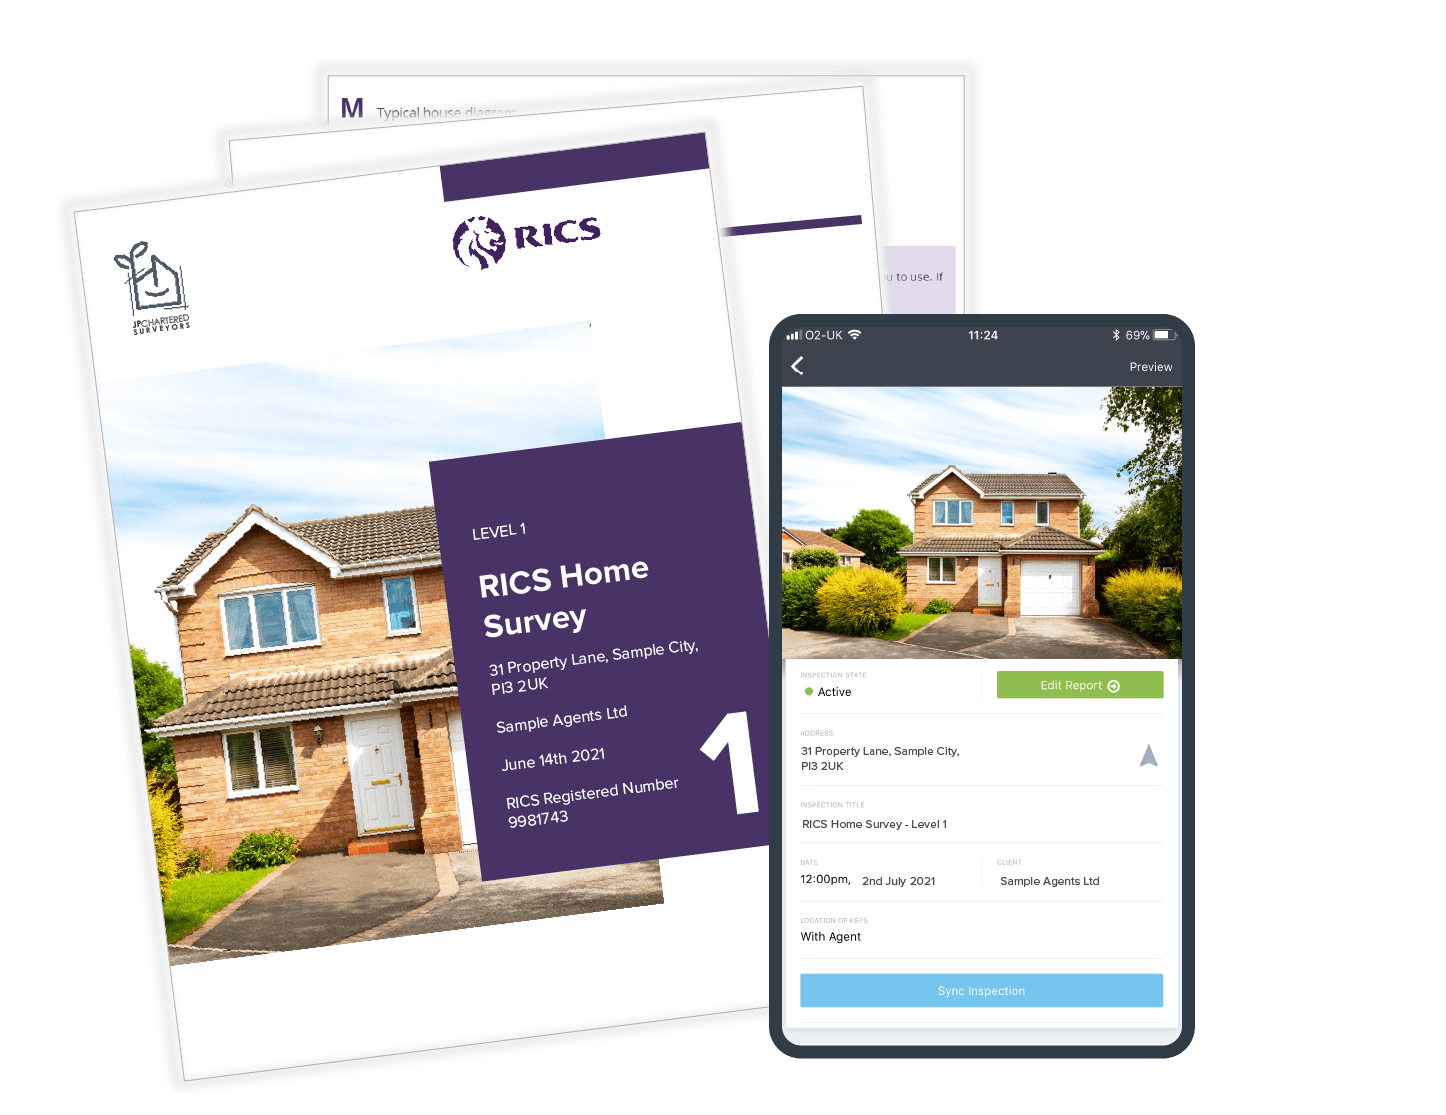 RICS Home Survey Reports